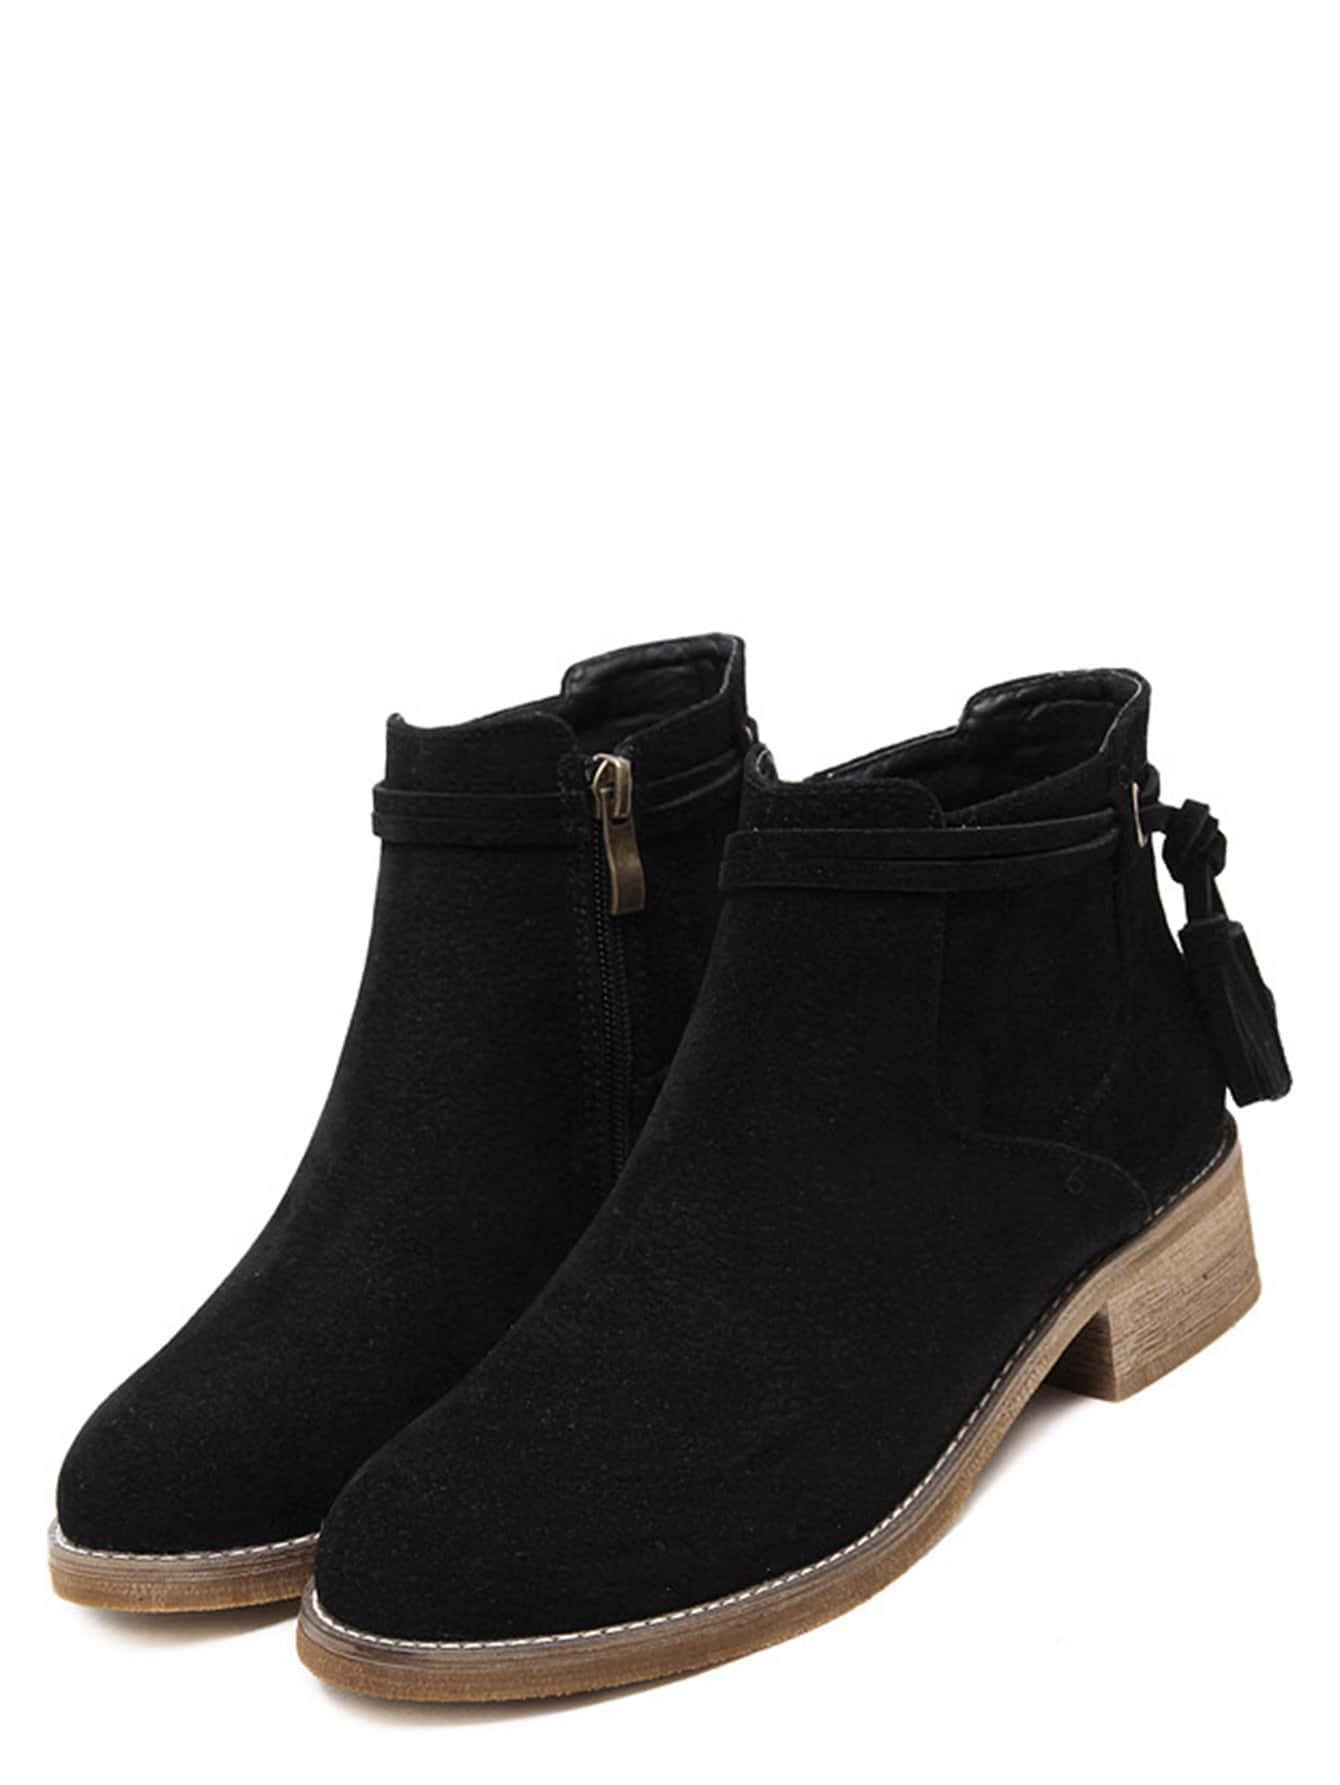 black faux suede distressed tassel cork heel ankle boots